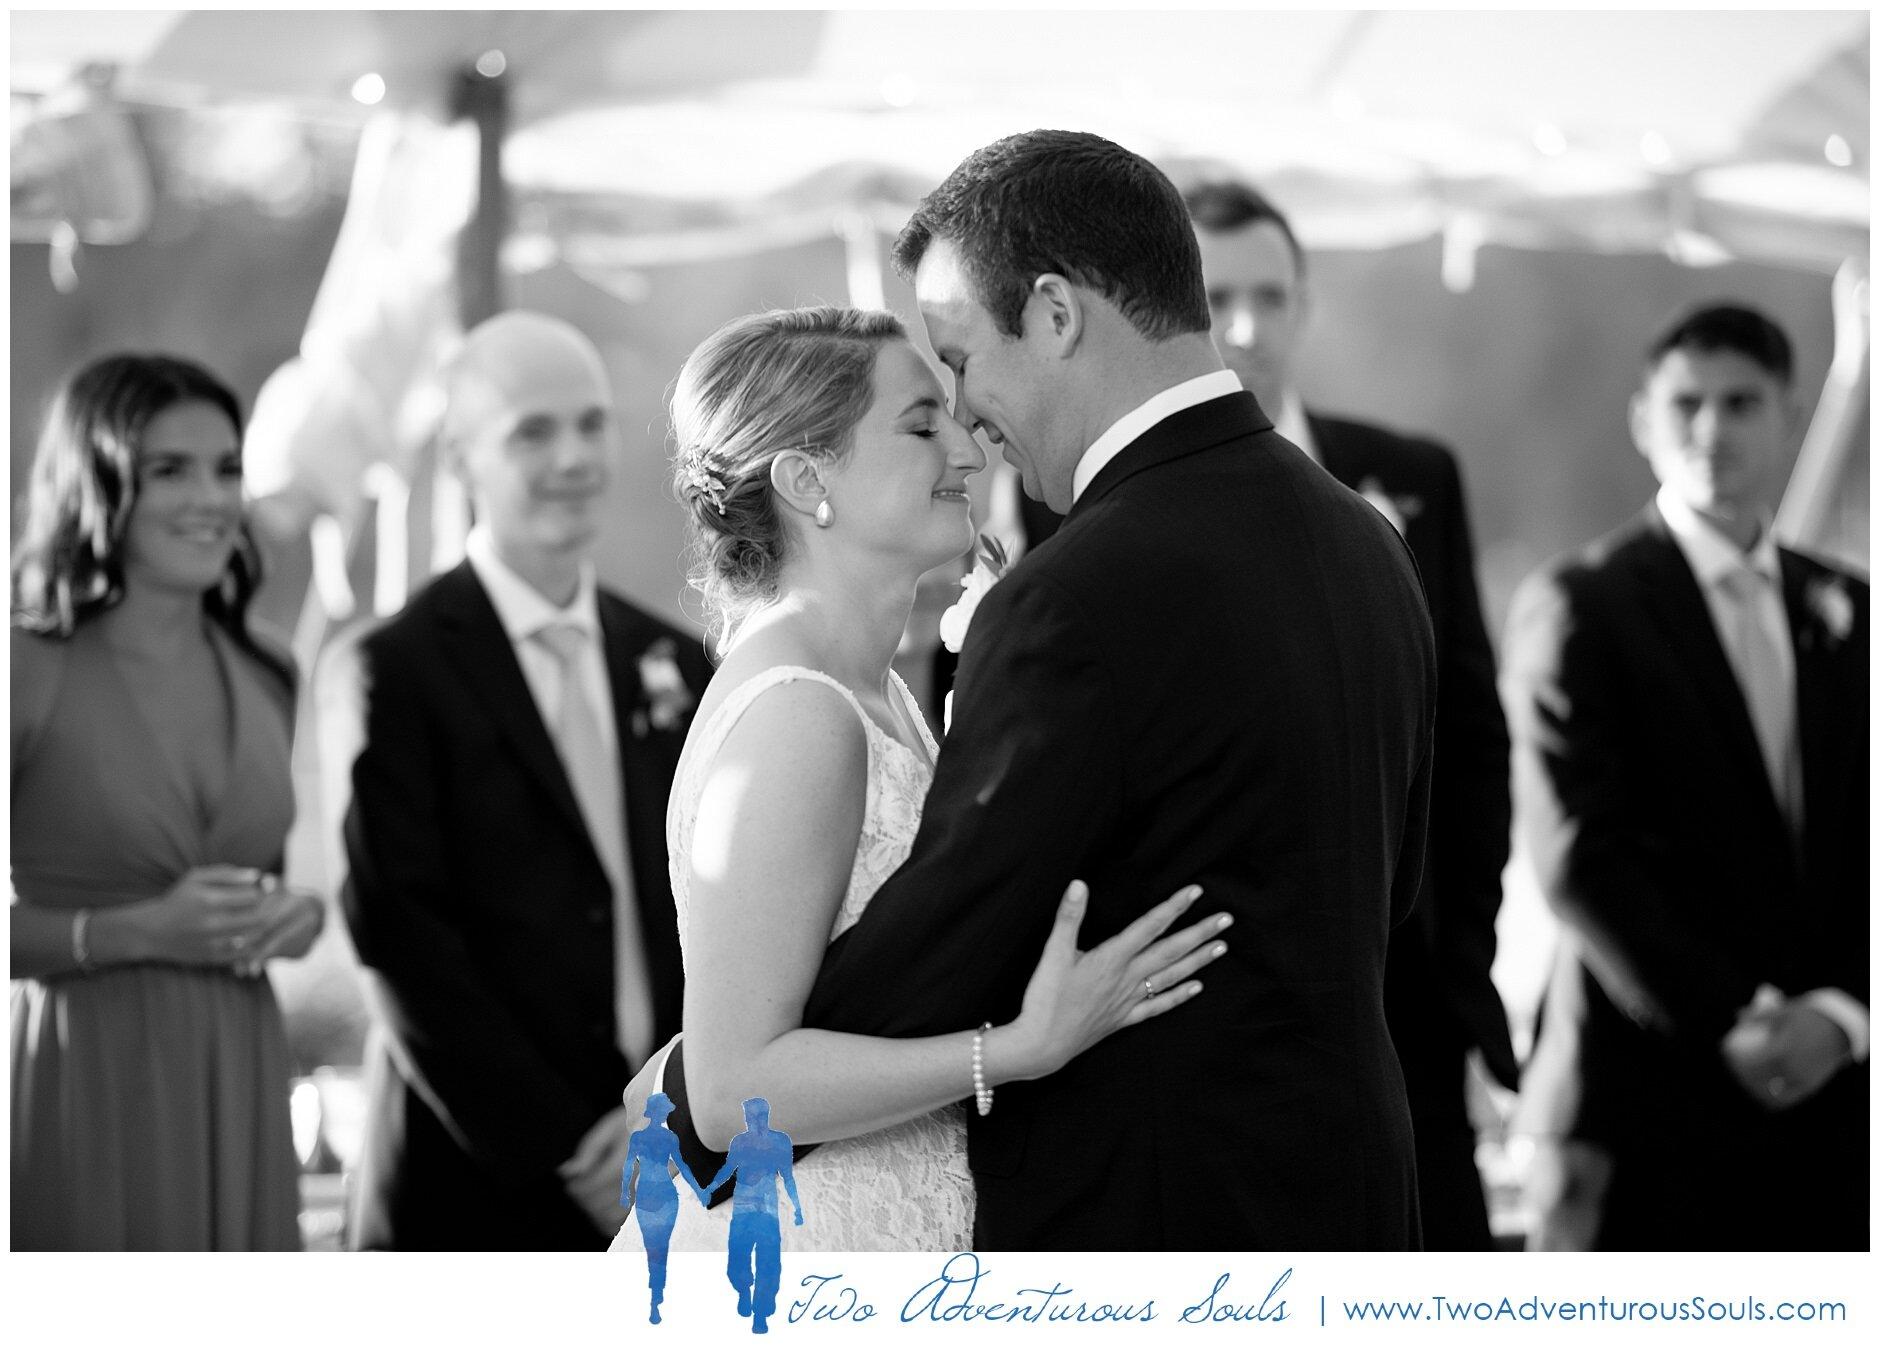 Breakwater Inn and Spa Wedding Photographers, Kennebunkport Wedding Photographers, Two Adventurous Souls- 092119_0047.jpg